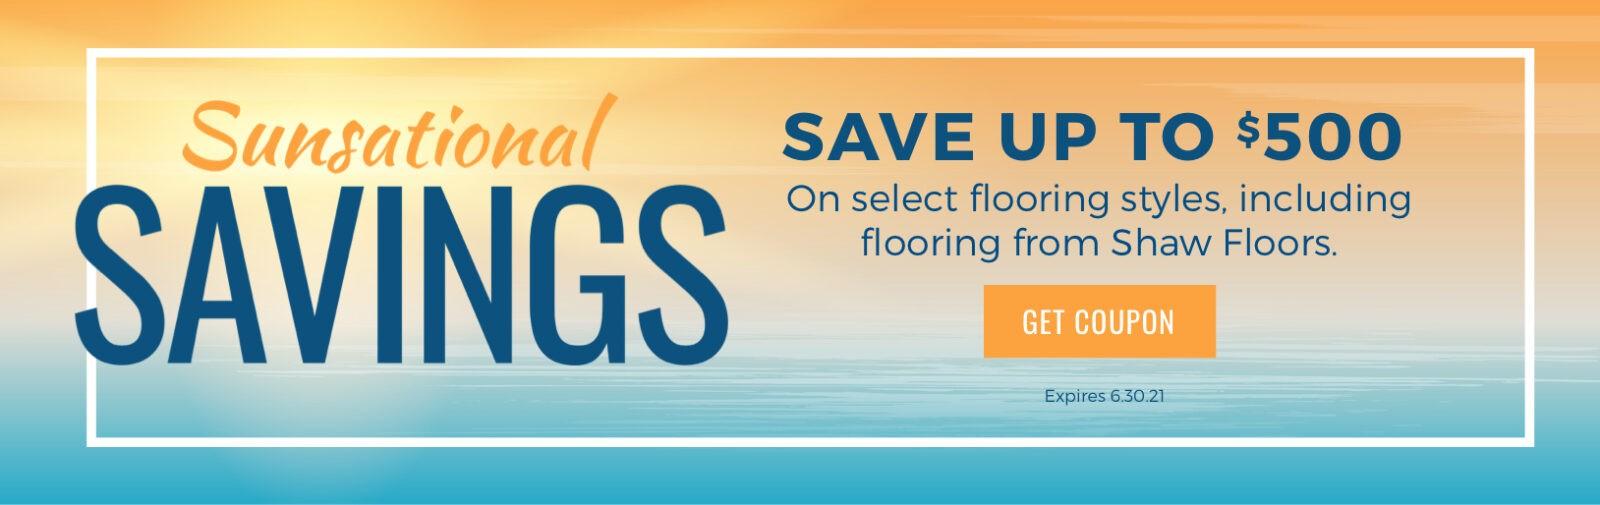 Sunsational Savings Sale   West Michigan Carpet Center